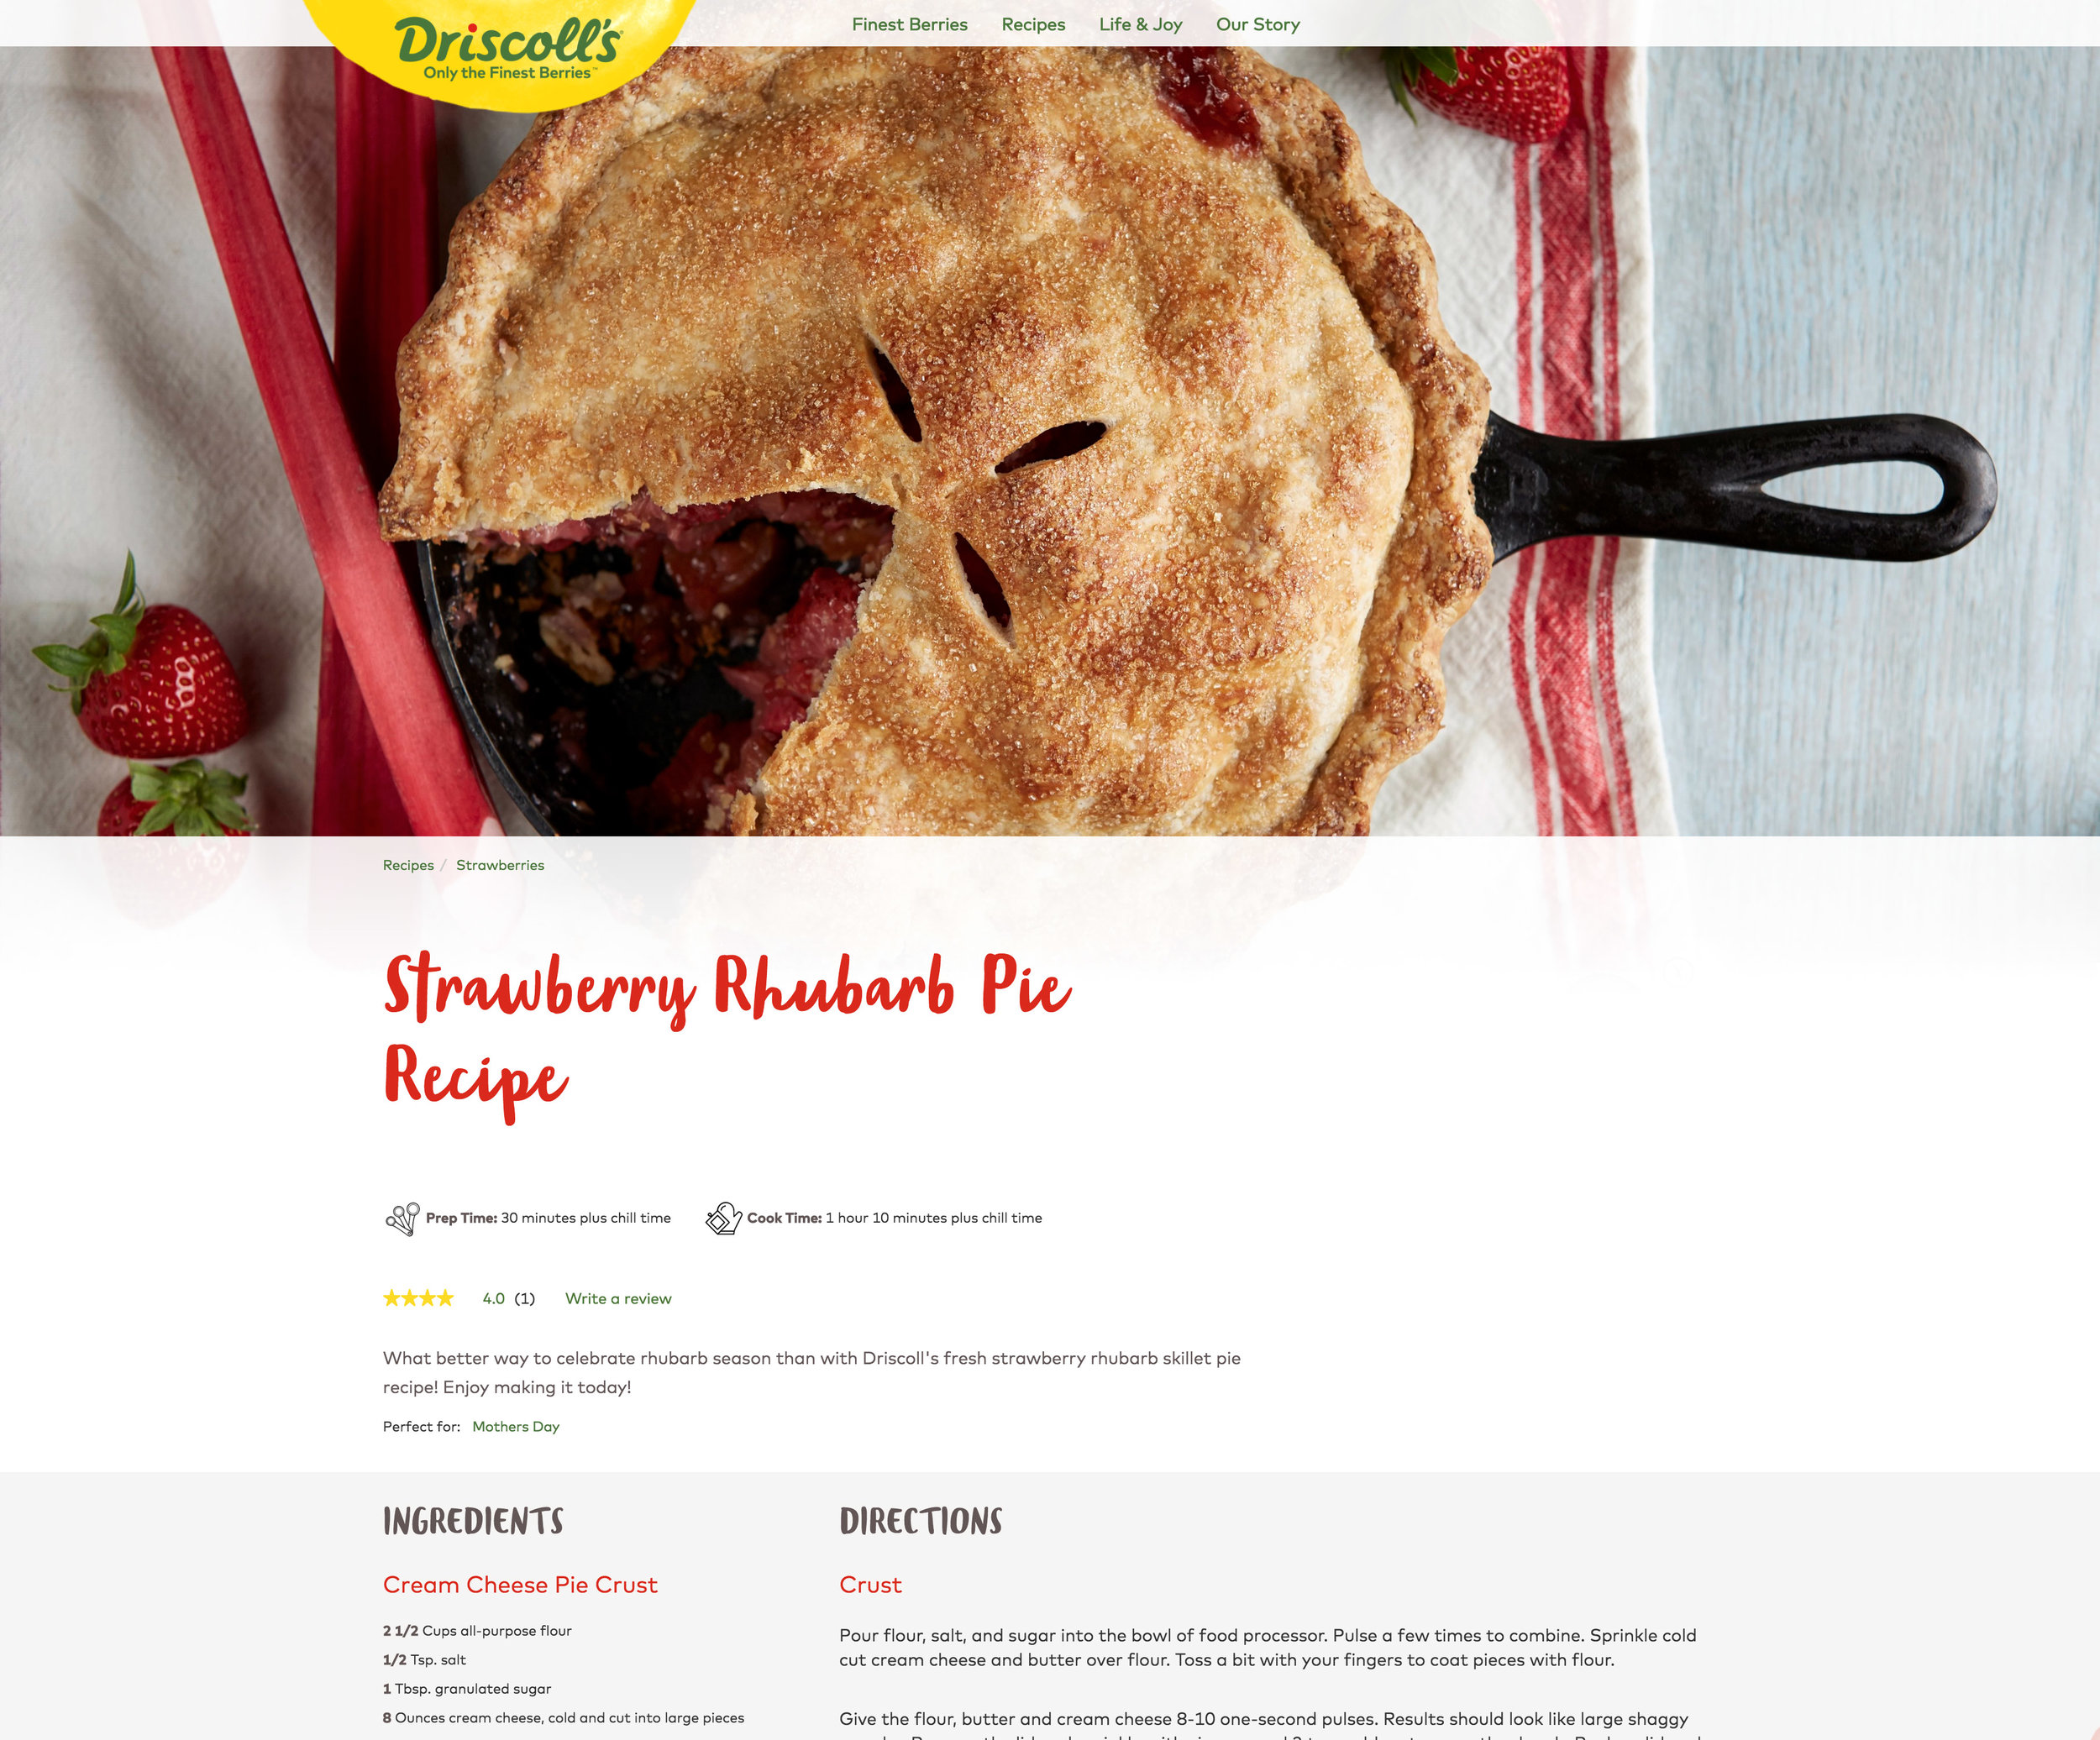 screencapture-driscolls-recipe-strawberry-rhubarb-pie-recipe-1478960294775.jpg